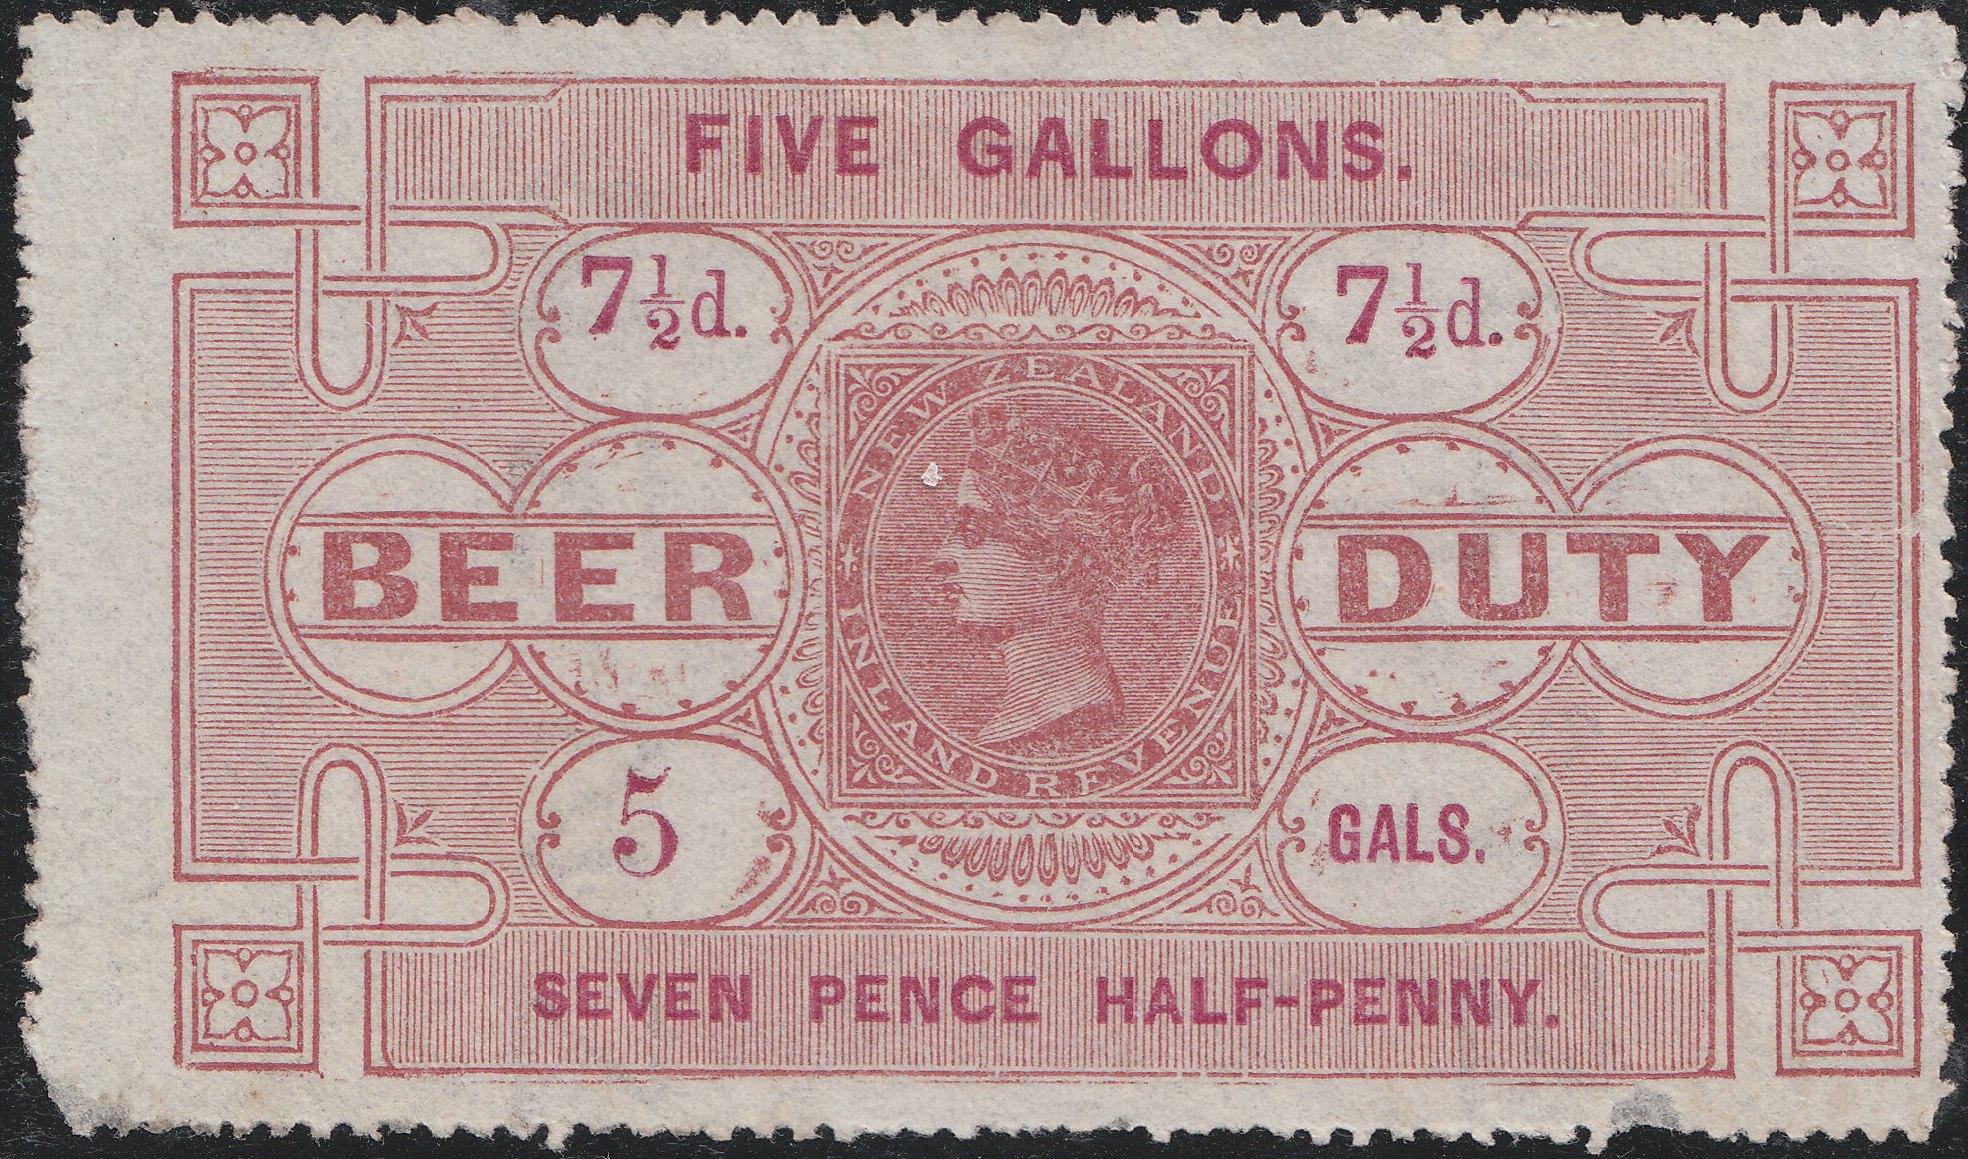 Beer Duty - 1878 7 1/2d Red-Brown & Carmine: Sans Serif Letters